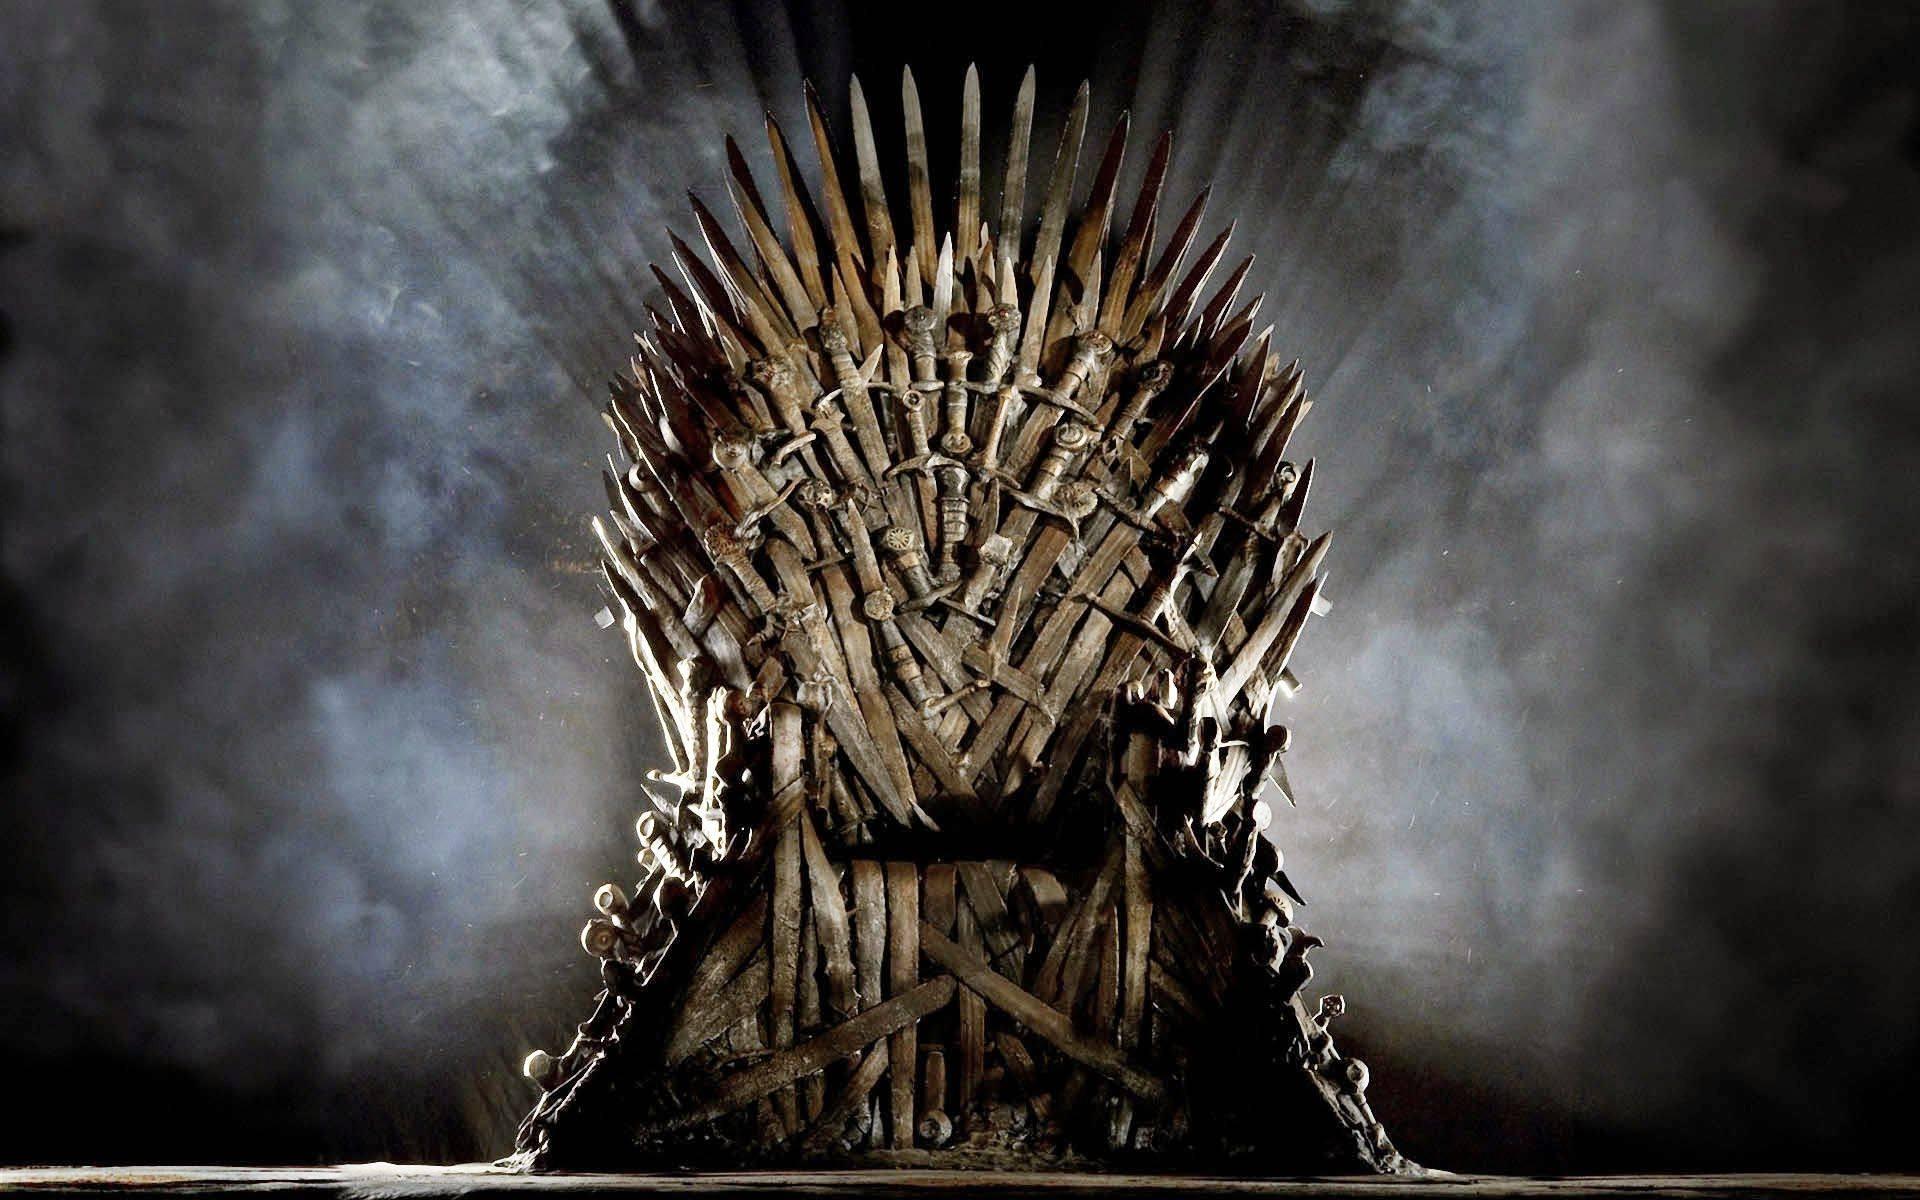 game-of-thrones-targaryen-origins-4